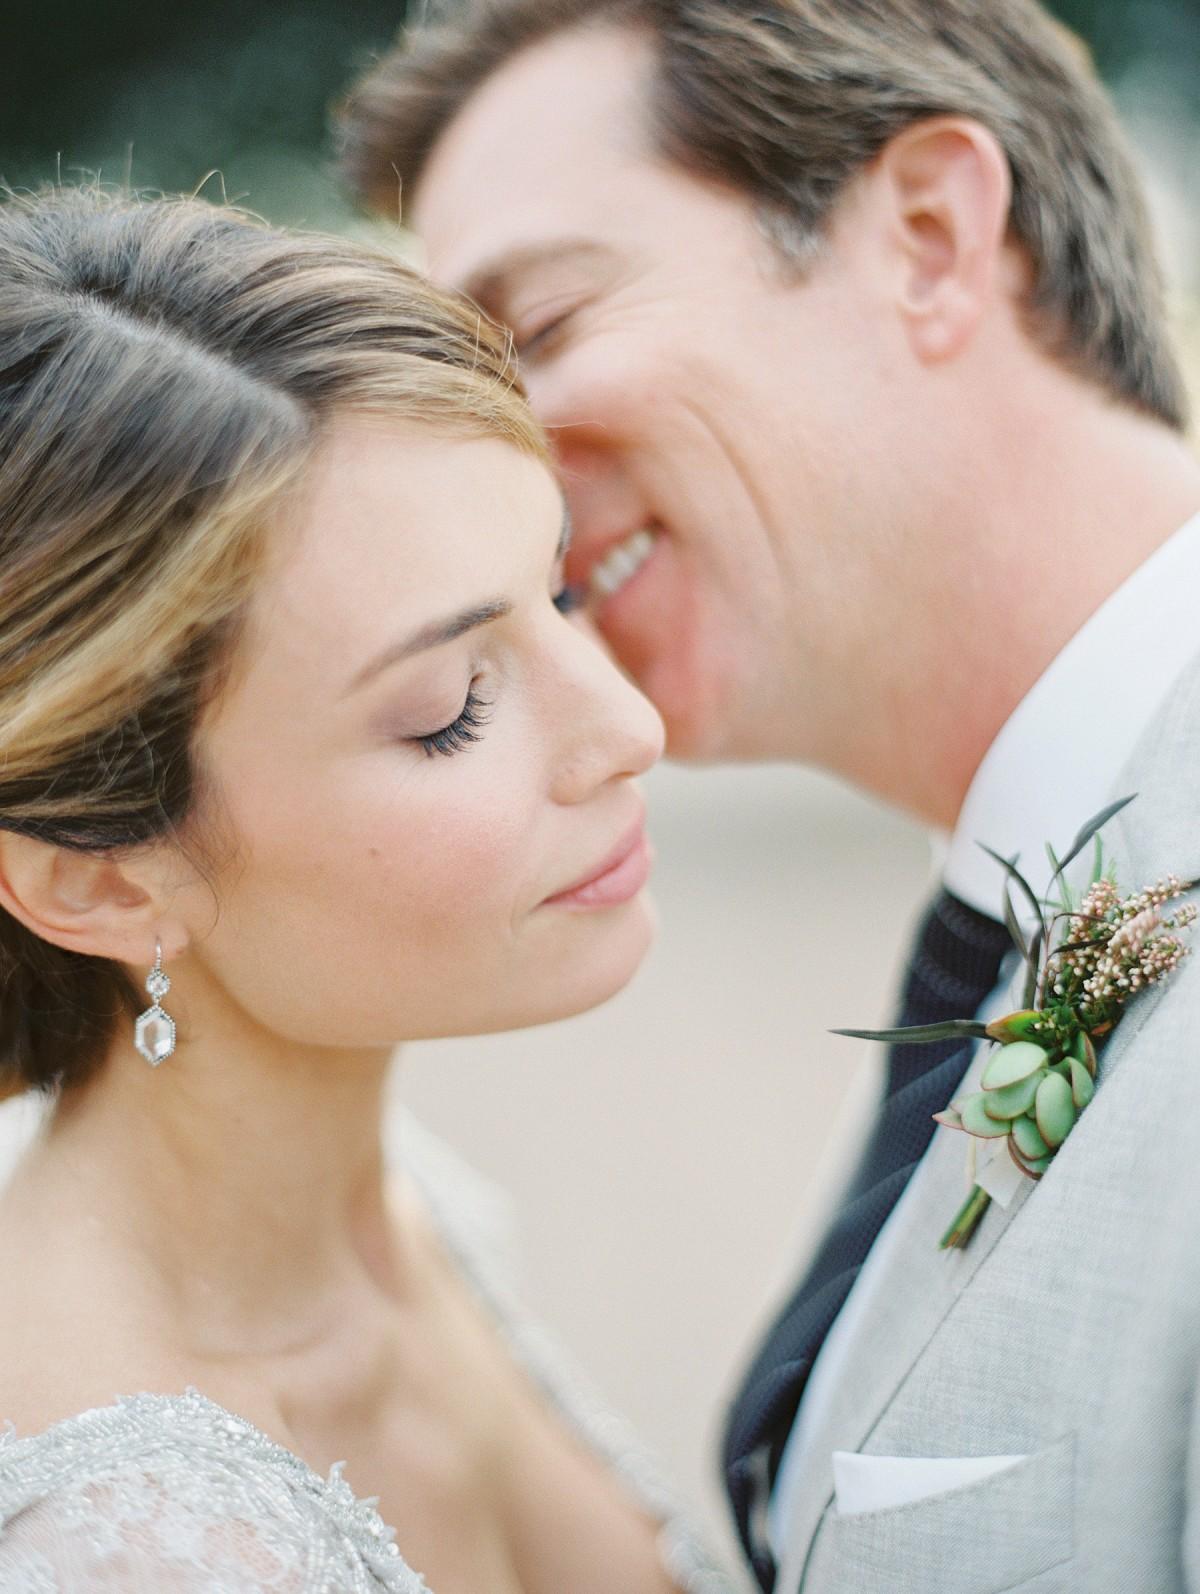 Sophisticated Outdoor Wedding at Firestone Vineyard